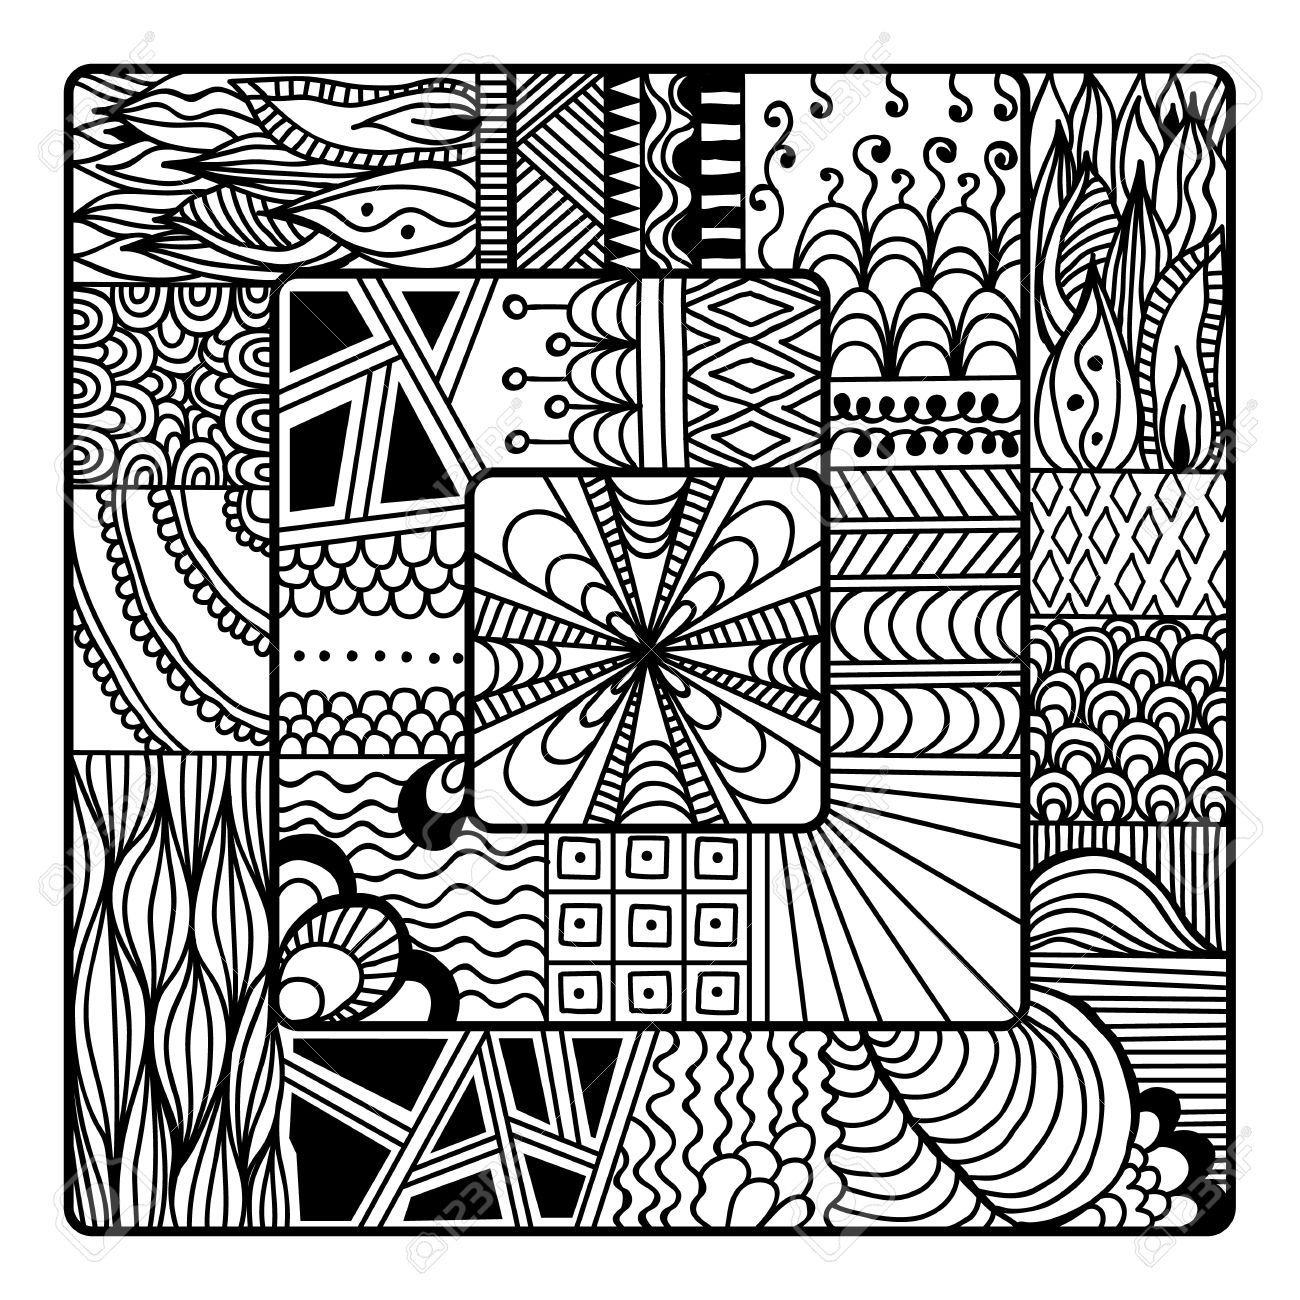 square for art coloring book zendoodle mandala design black white hand sketched - Doodle Art Coloring Book